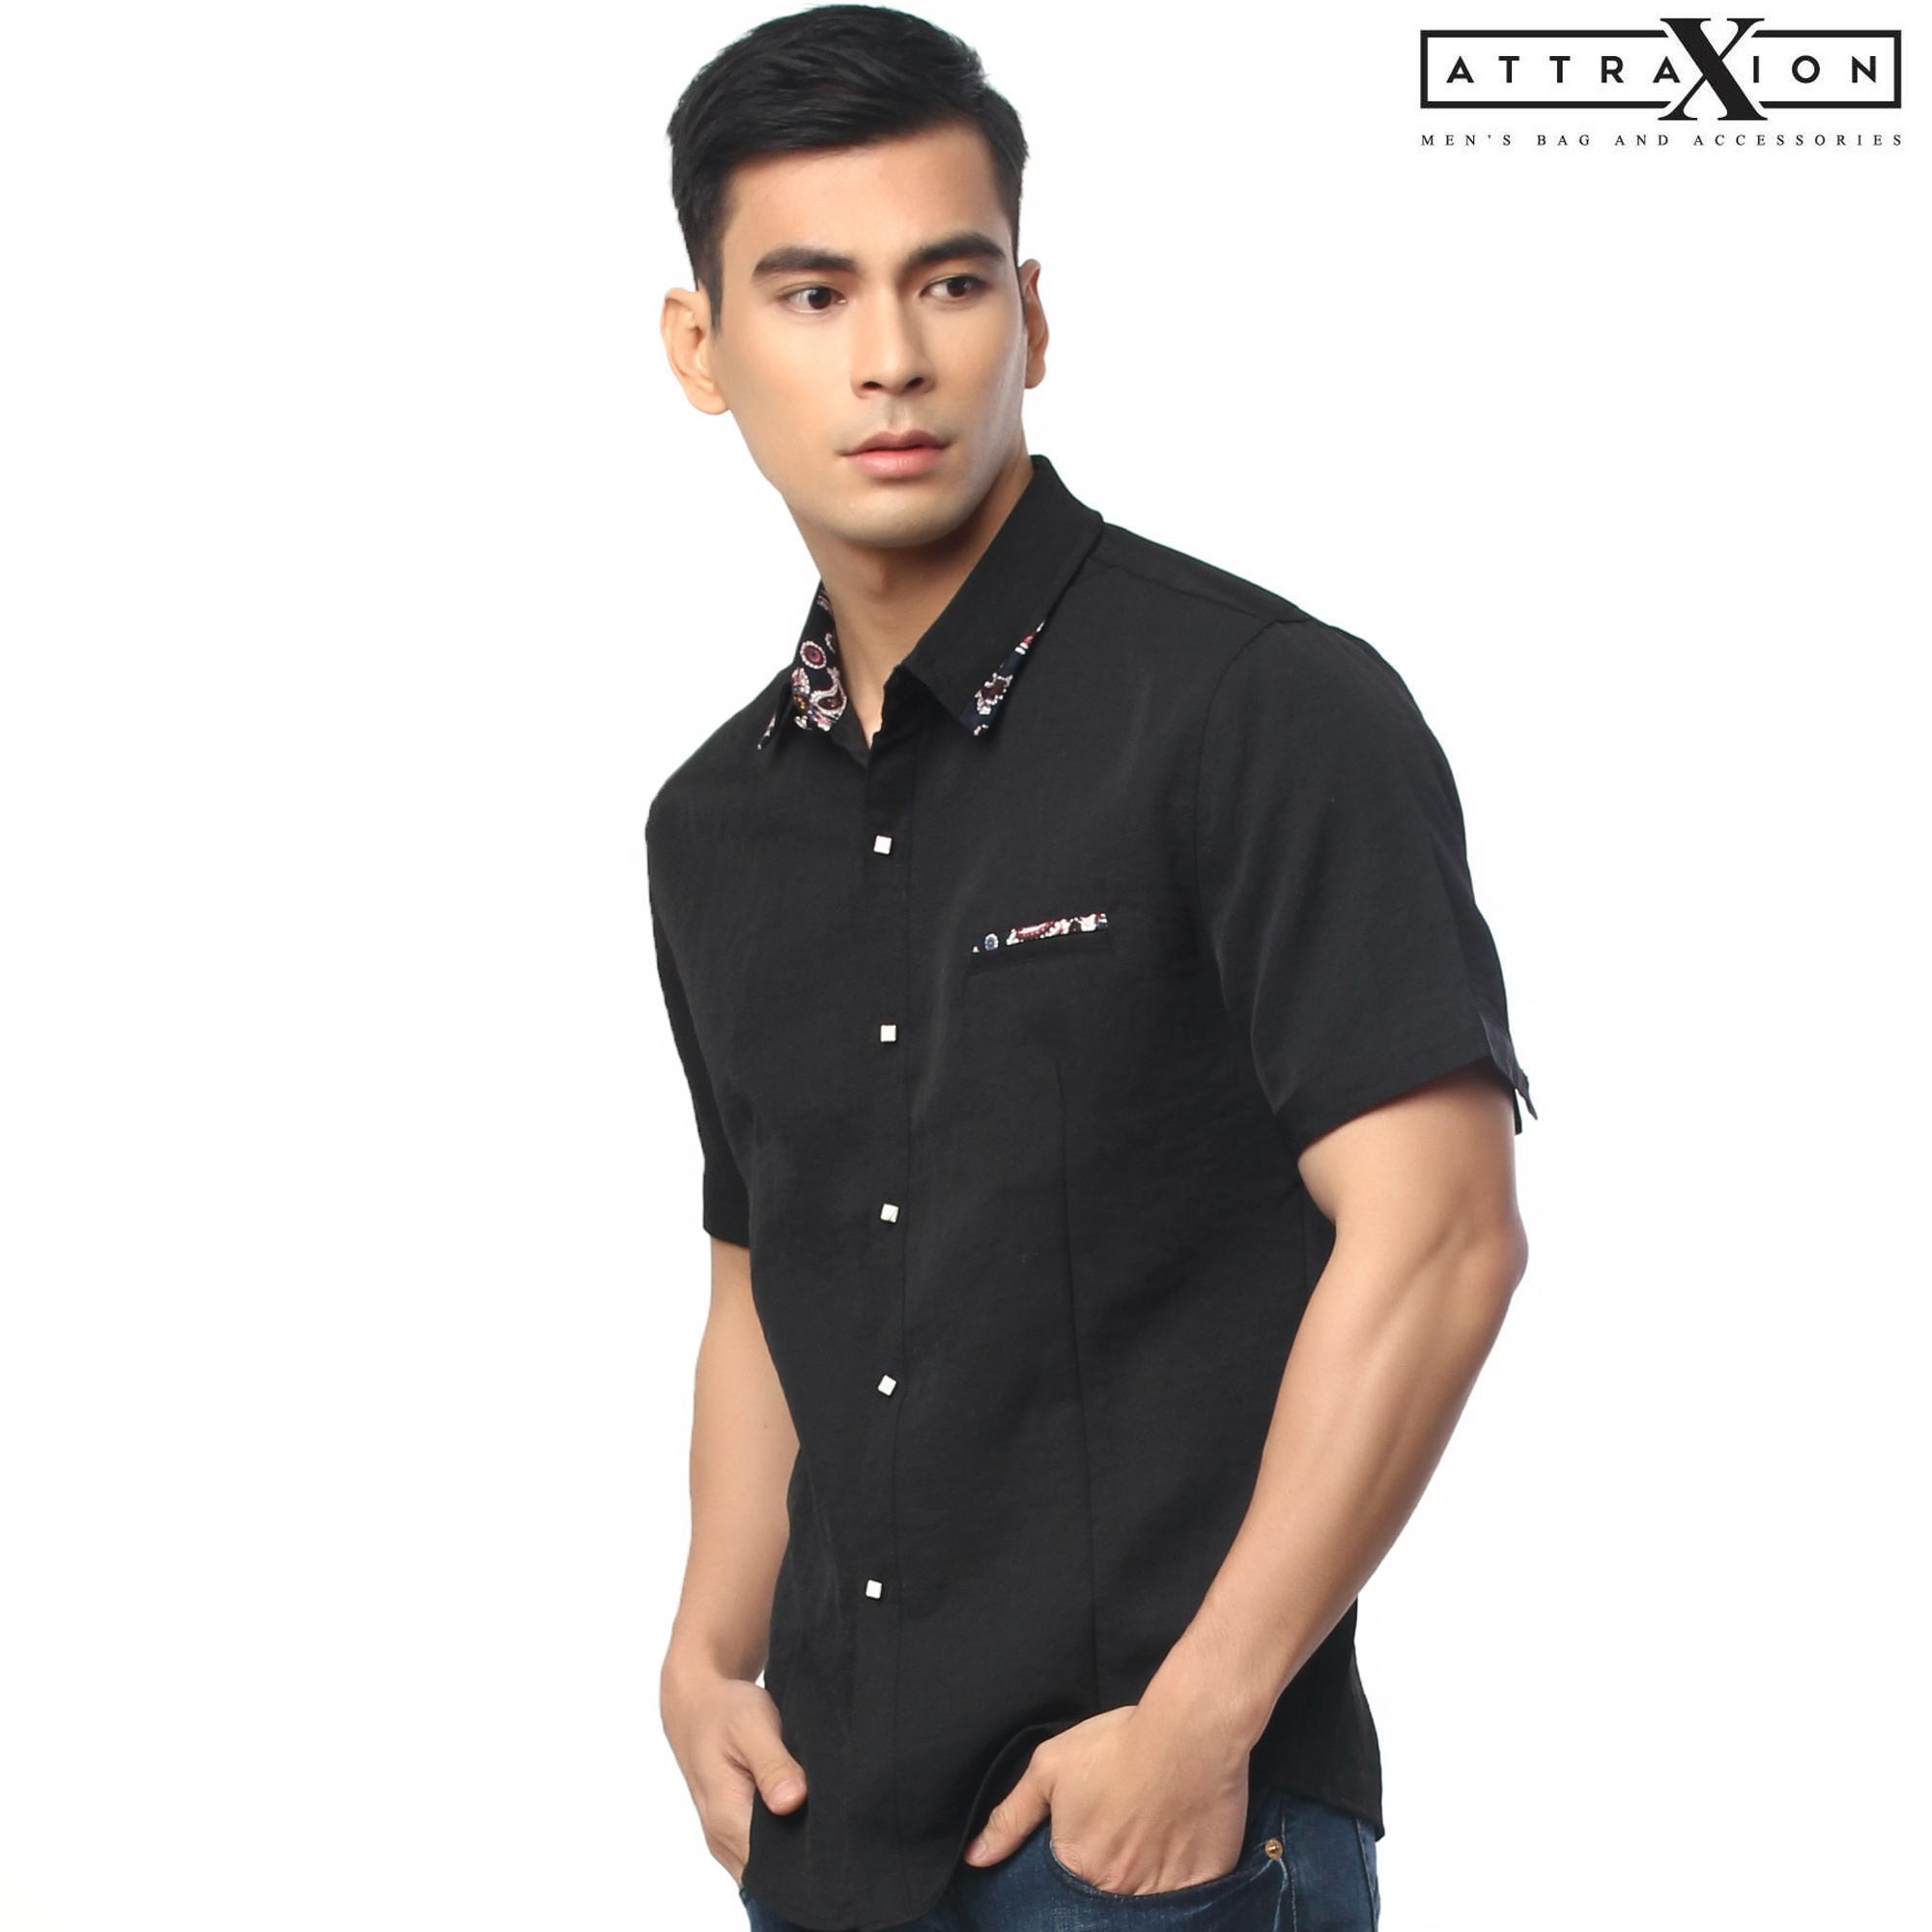 fe2403dad3ab Shirt for Men for sale - Mens Fashion Shirt online brands